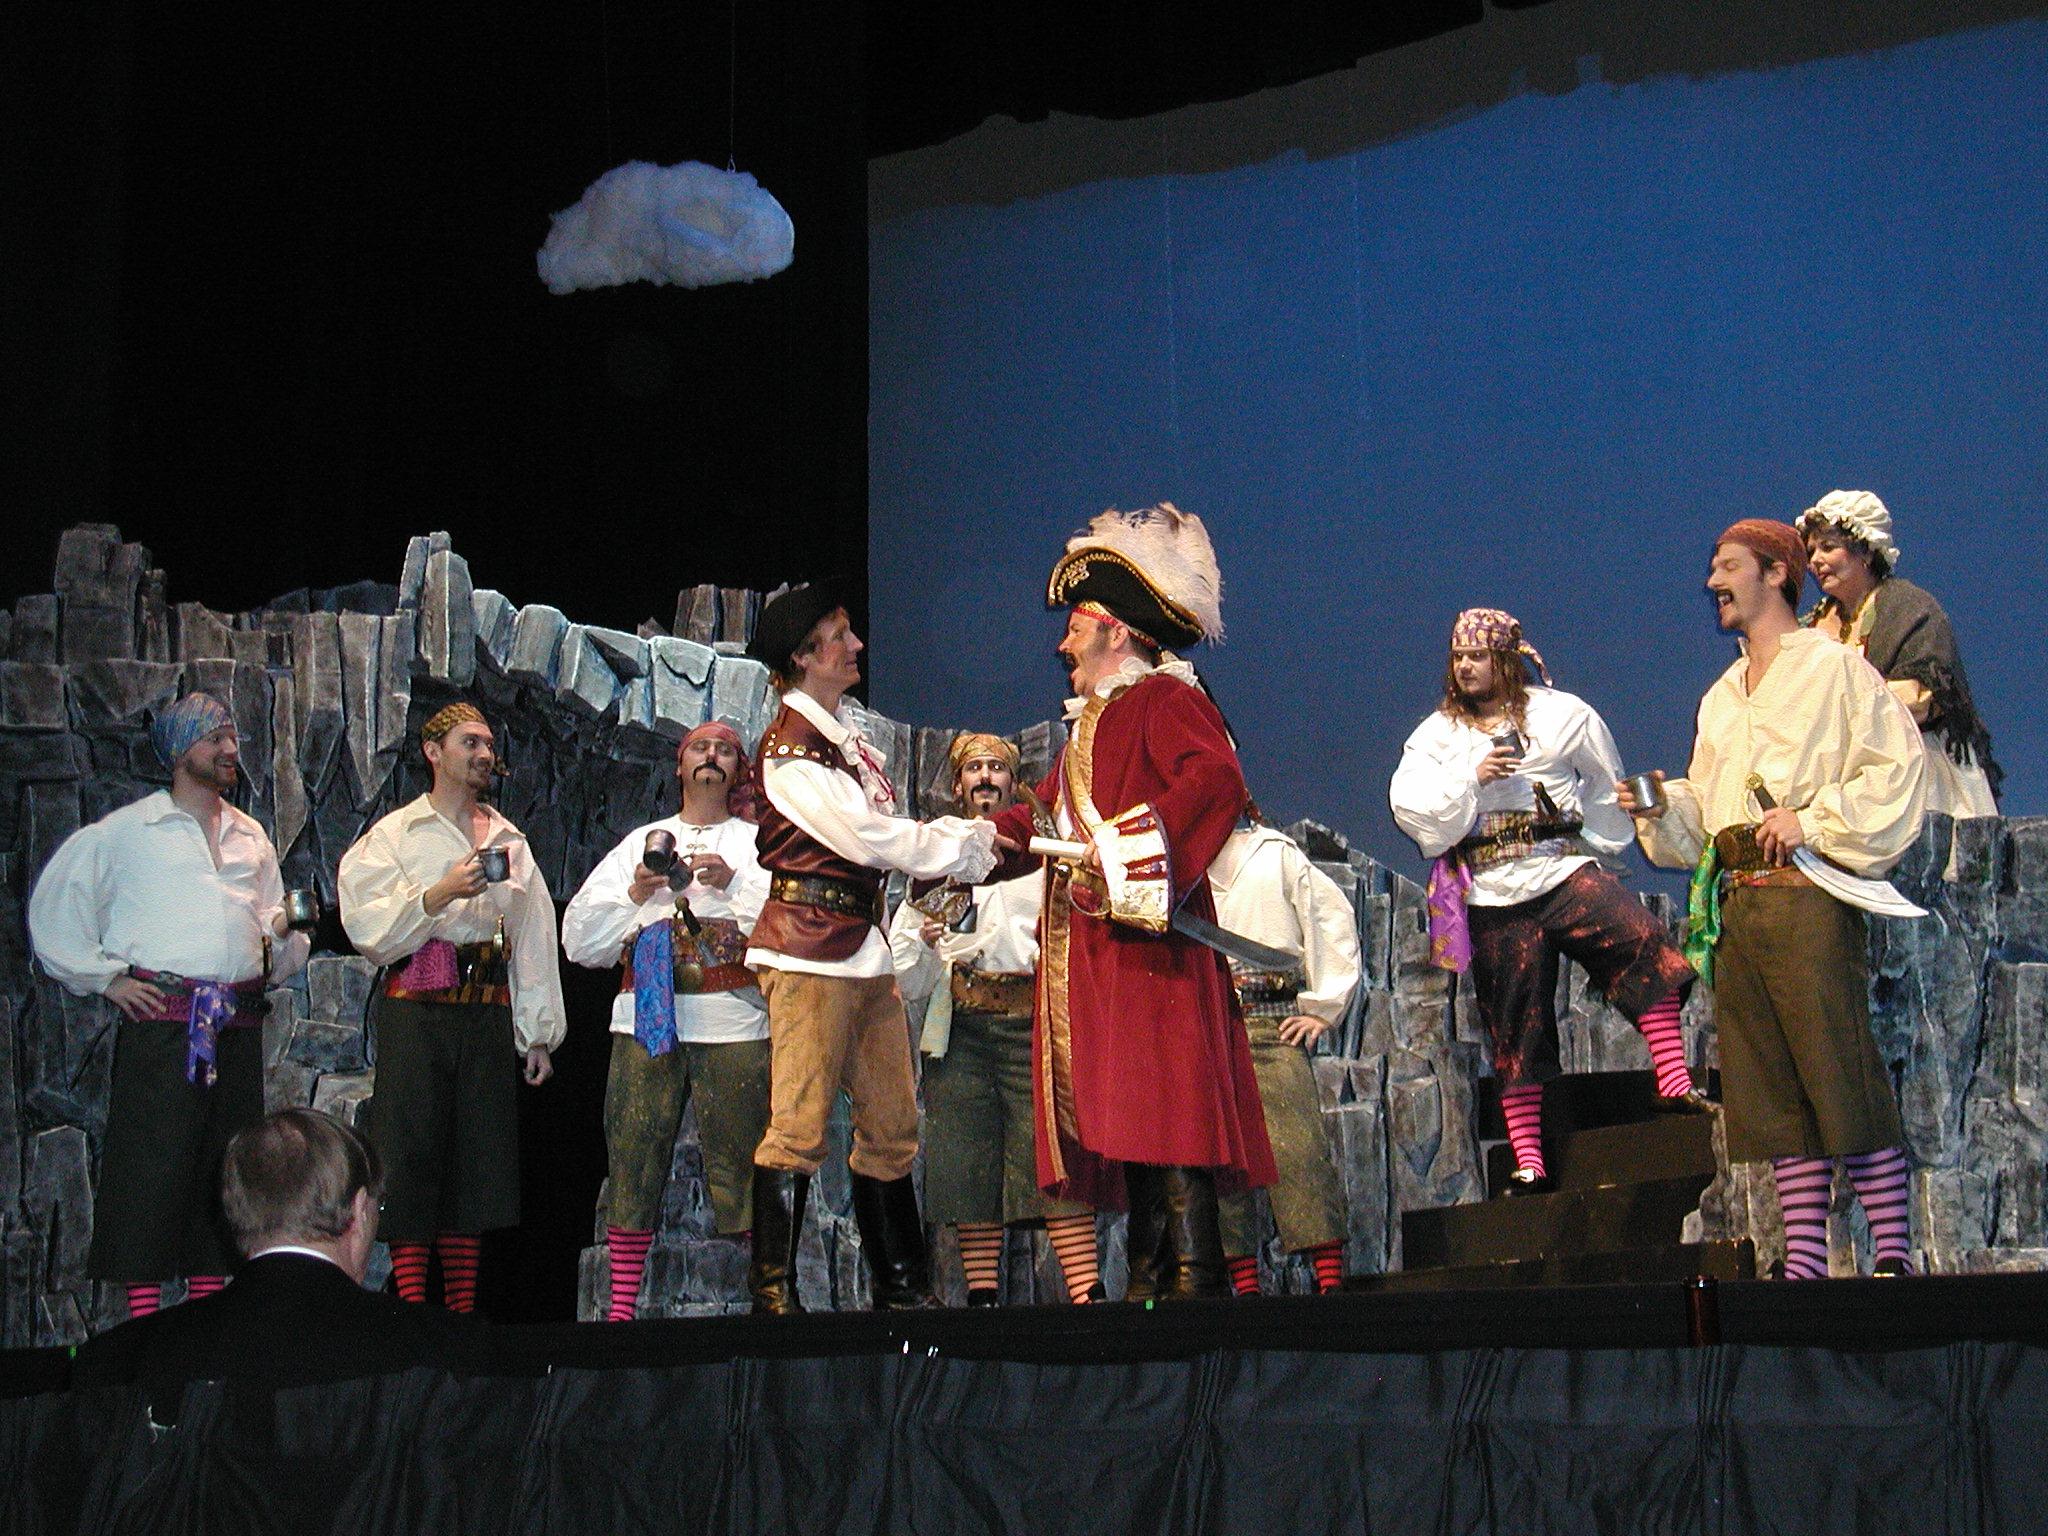 Pirates-rehearsal-10.12.05-050.jpg